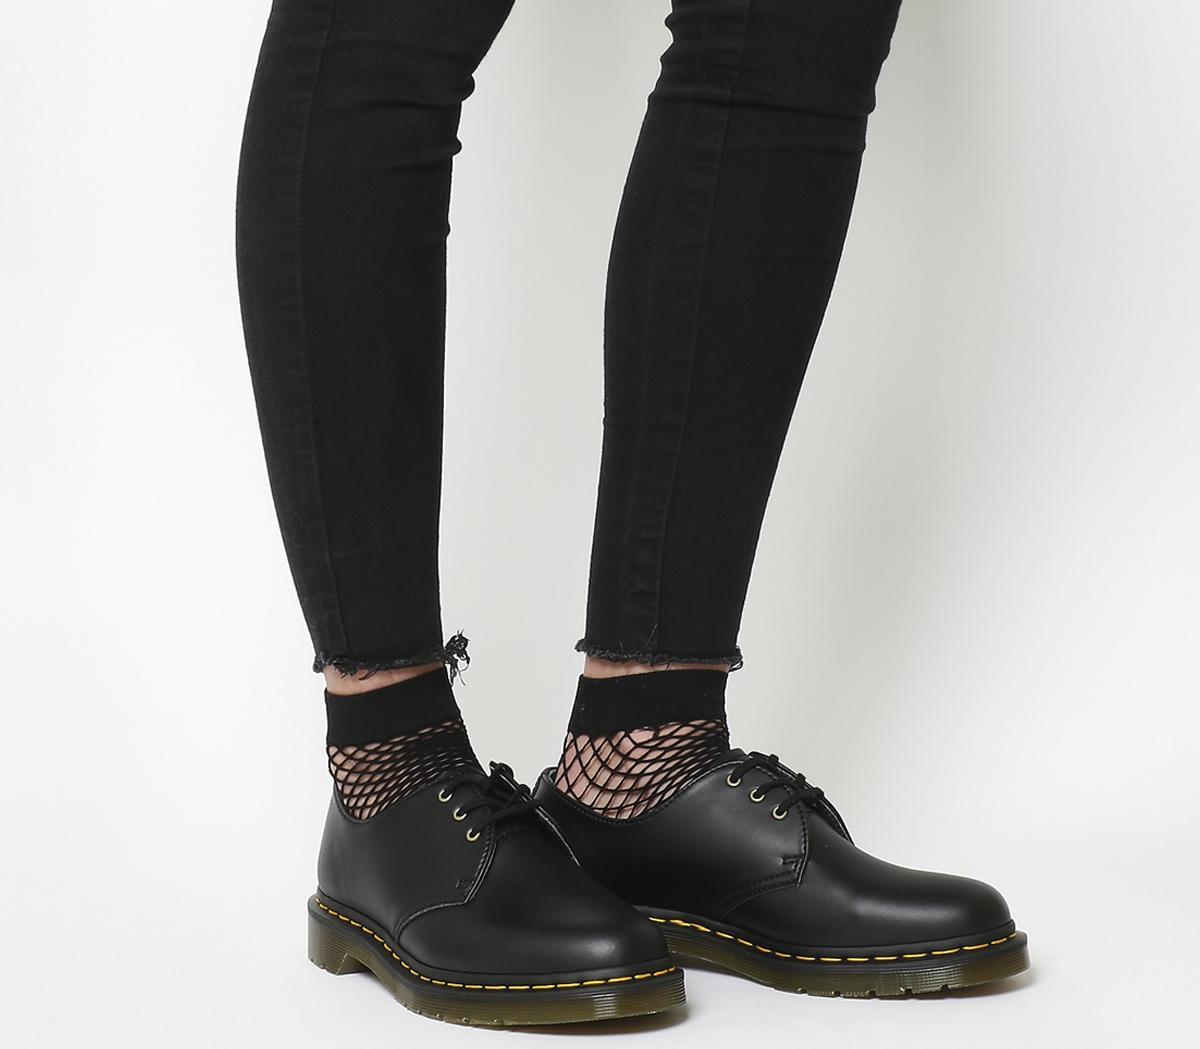 Vegan 1461 3 Eye Shoes F